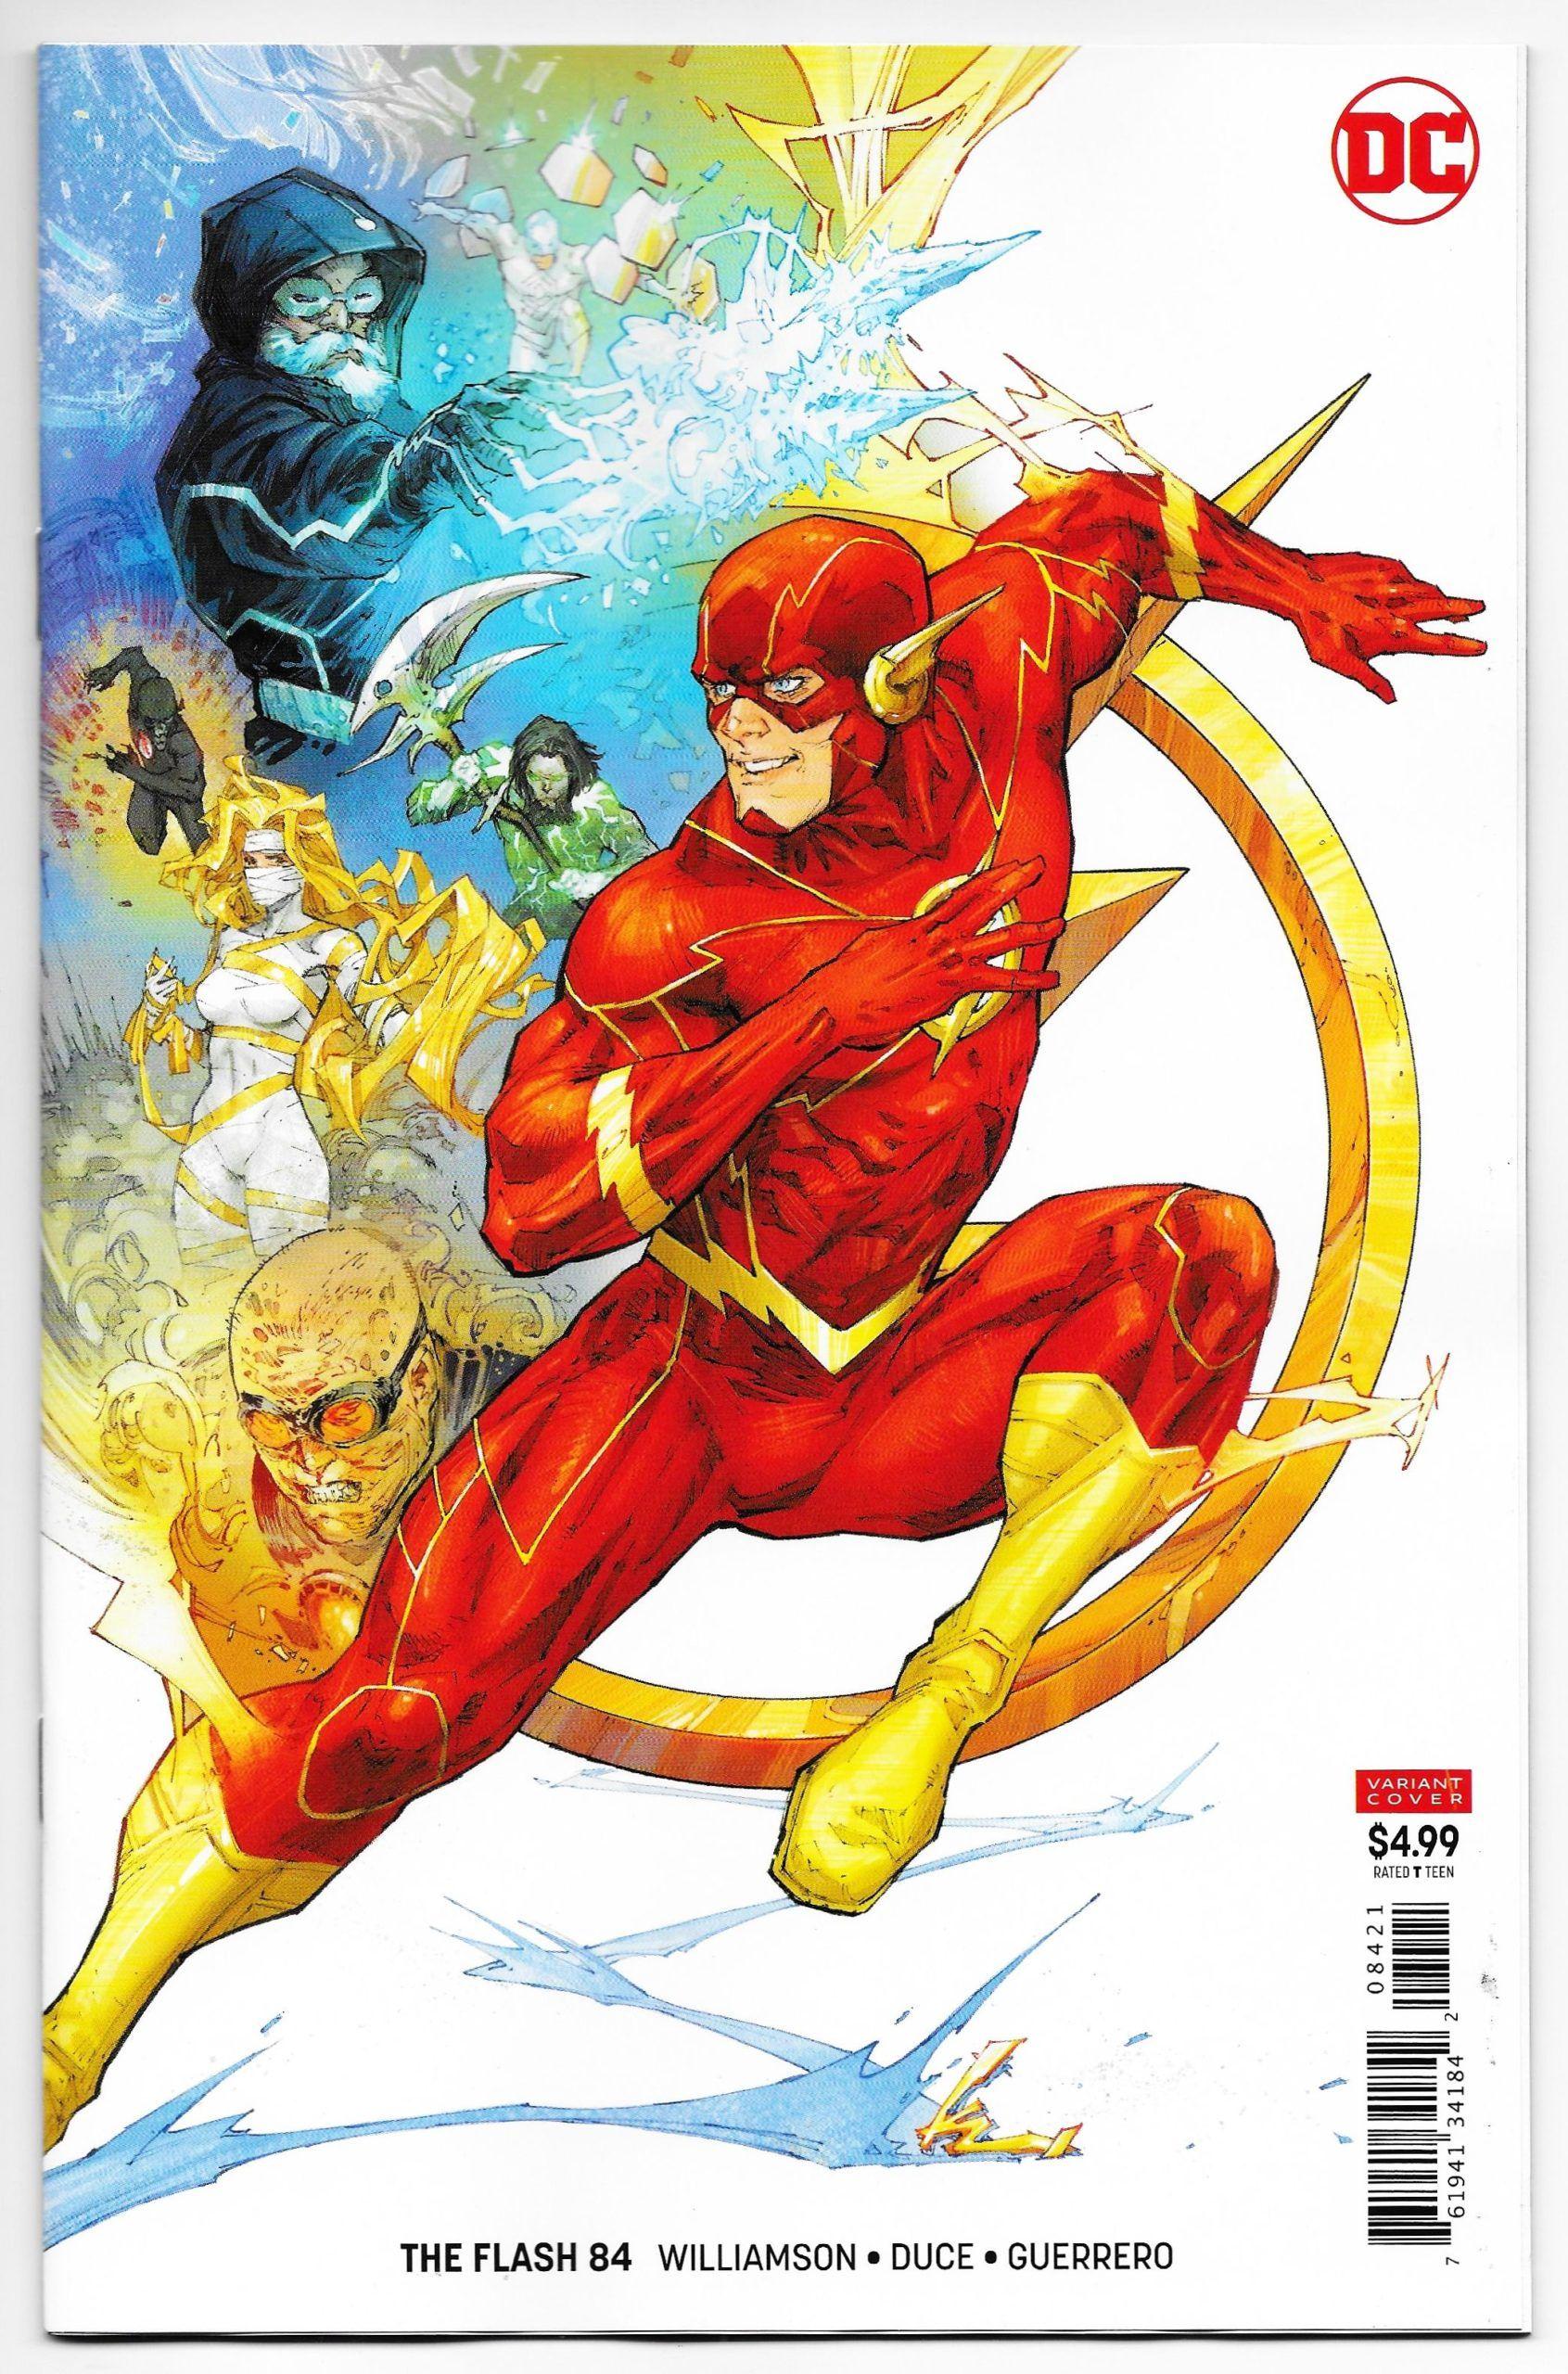 Flash 84 Rocafort Card Stock Variant Dc 2020 Nm Comic Books